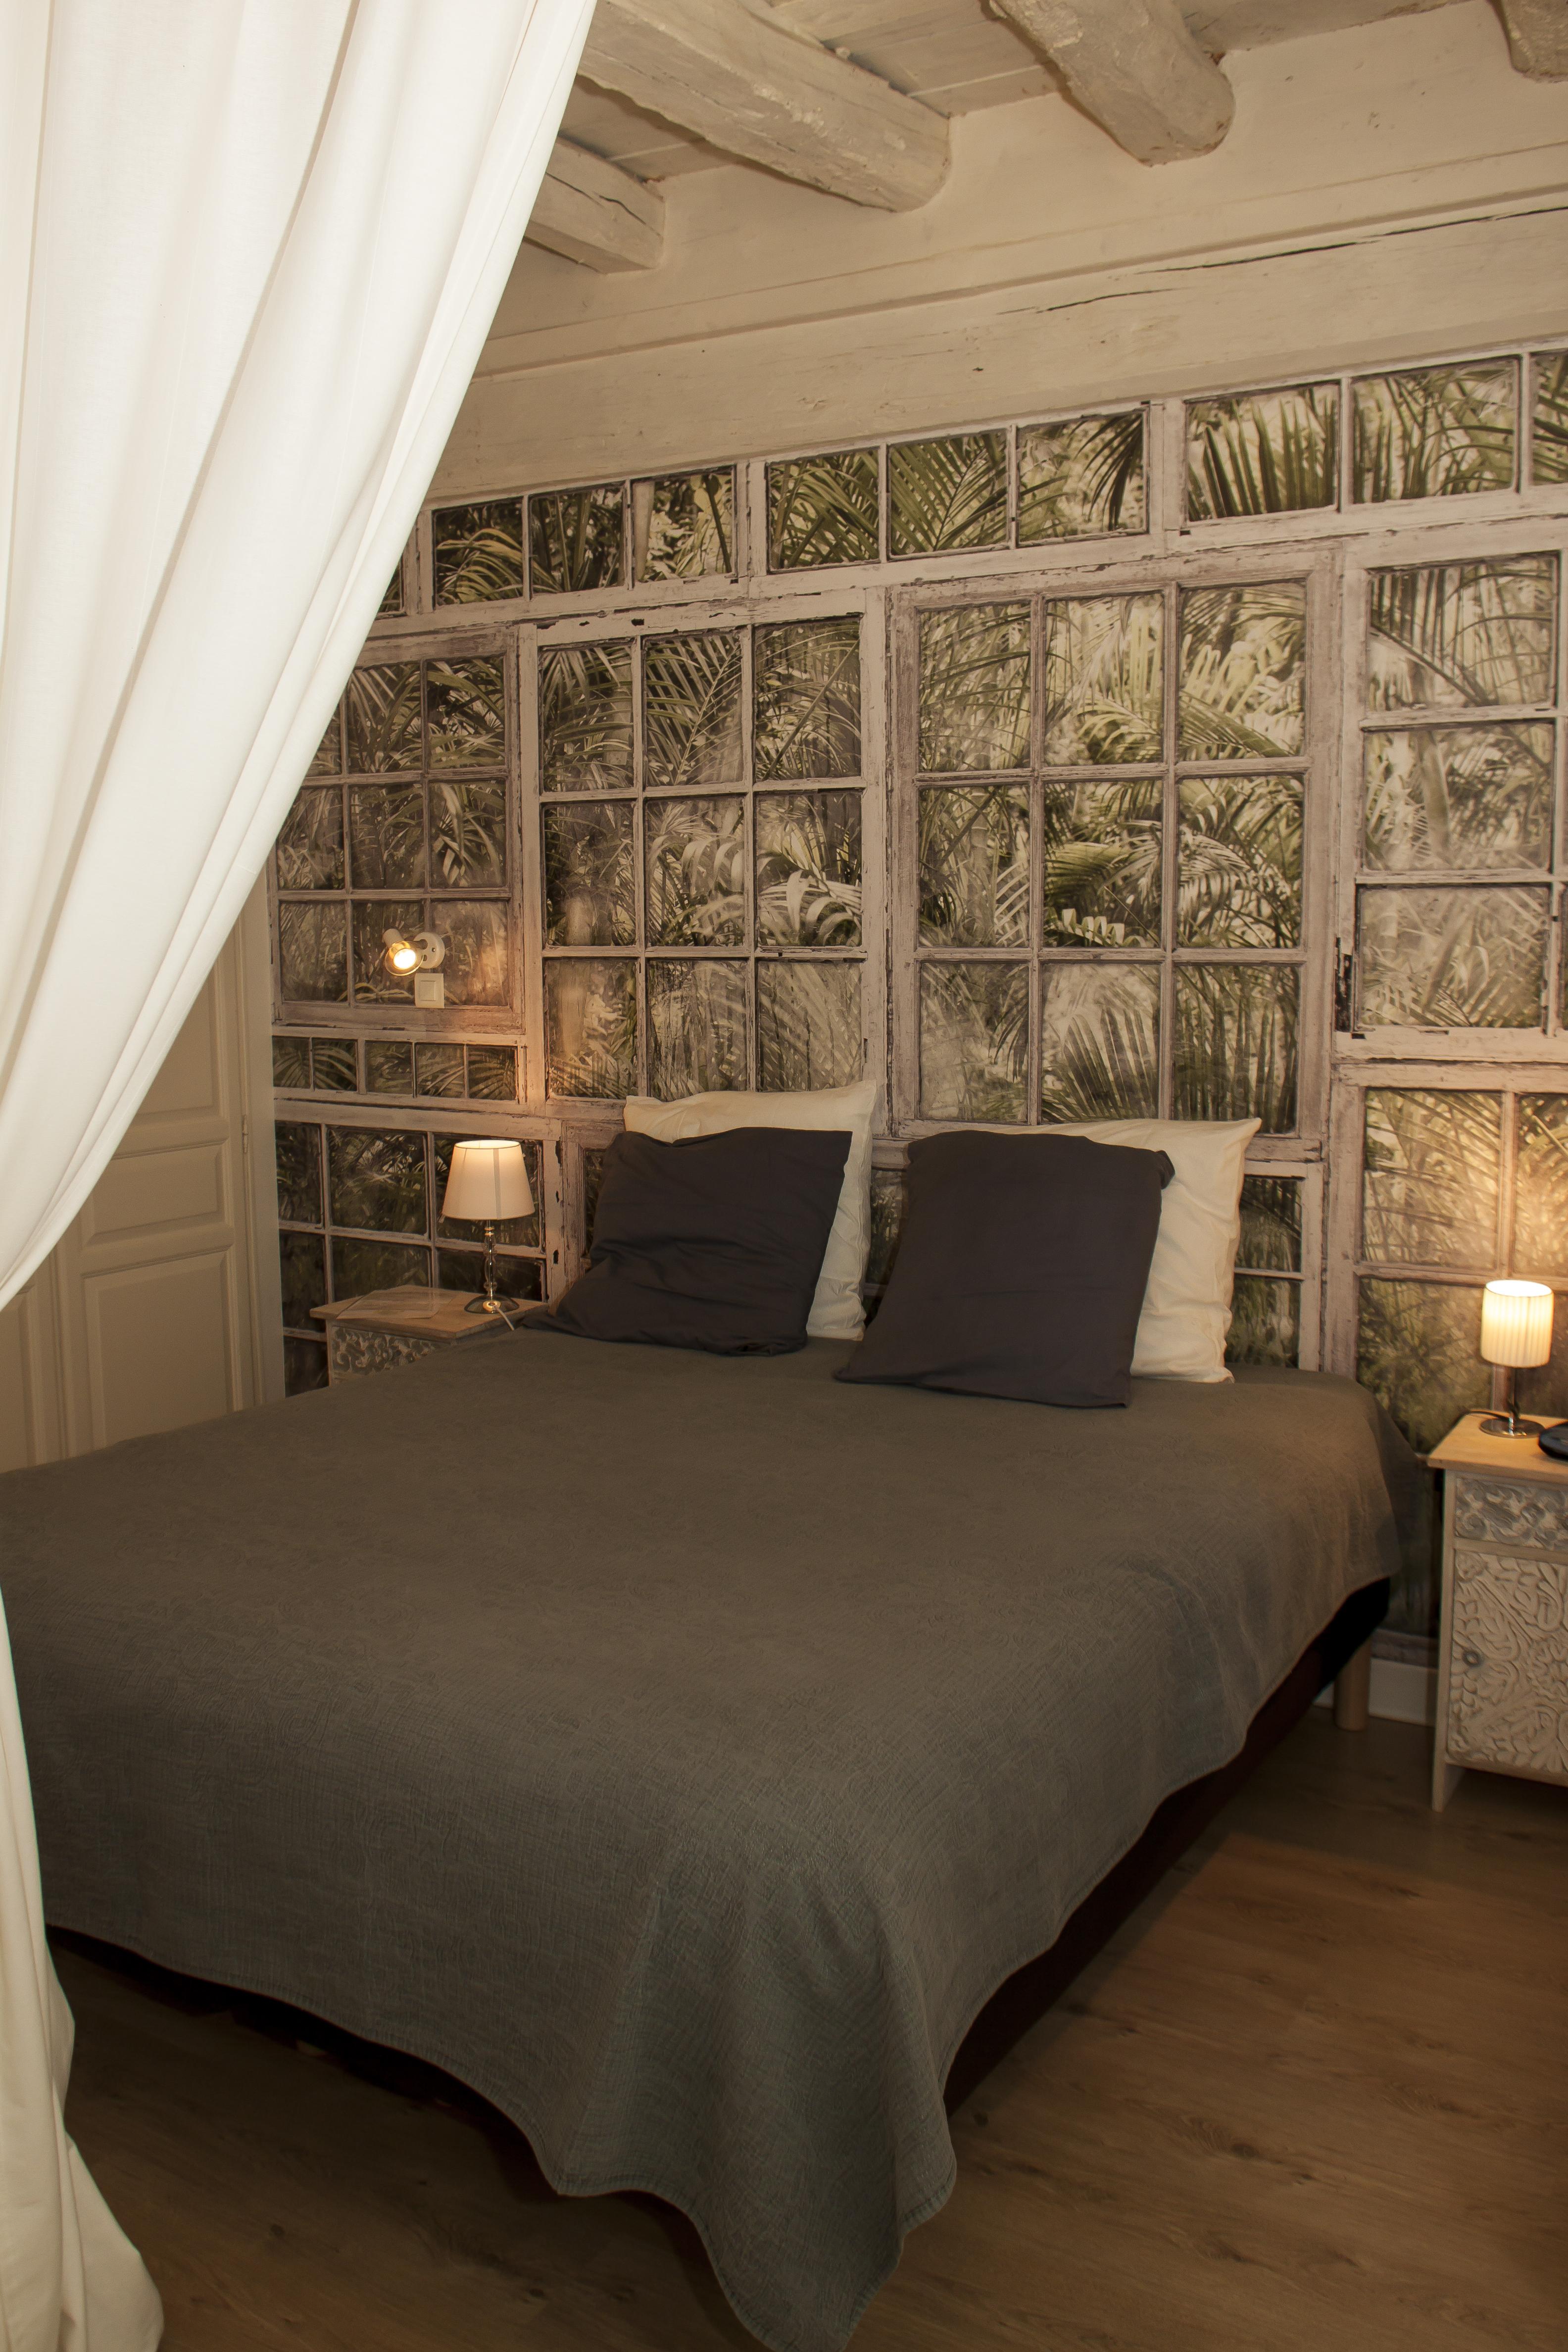 Chambres d'hôtes Le Clos de la Vigneronne©